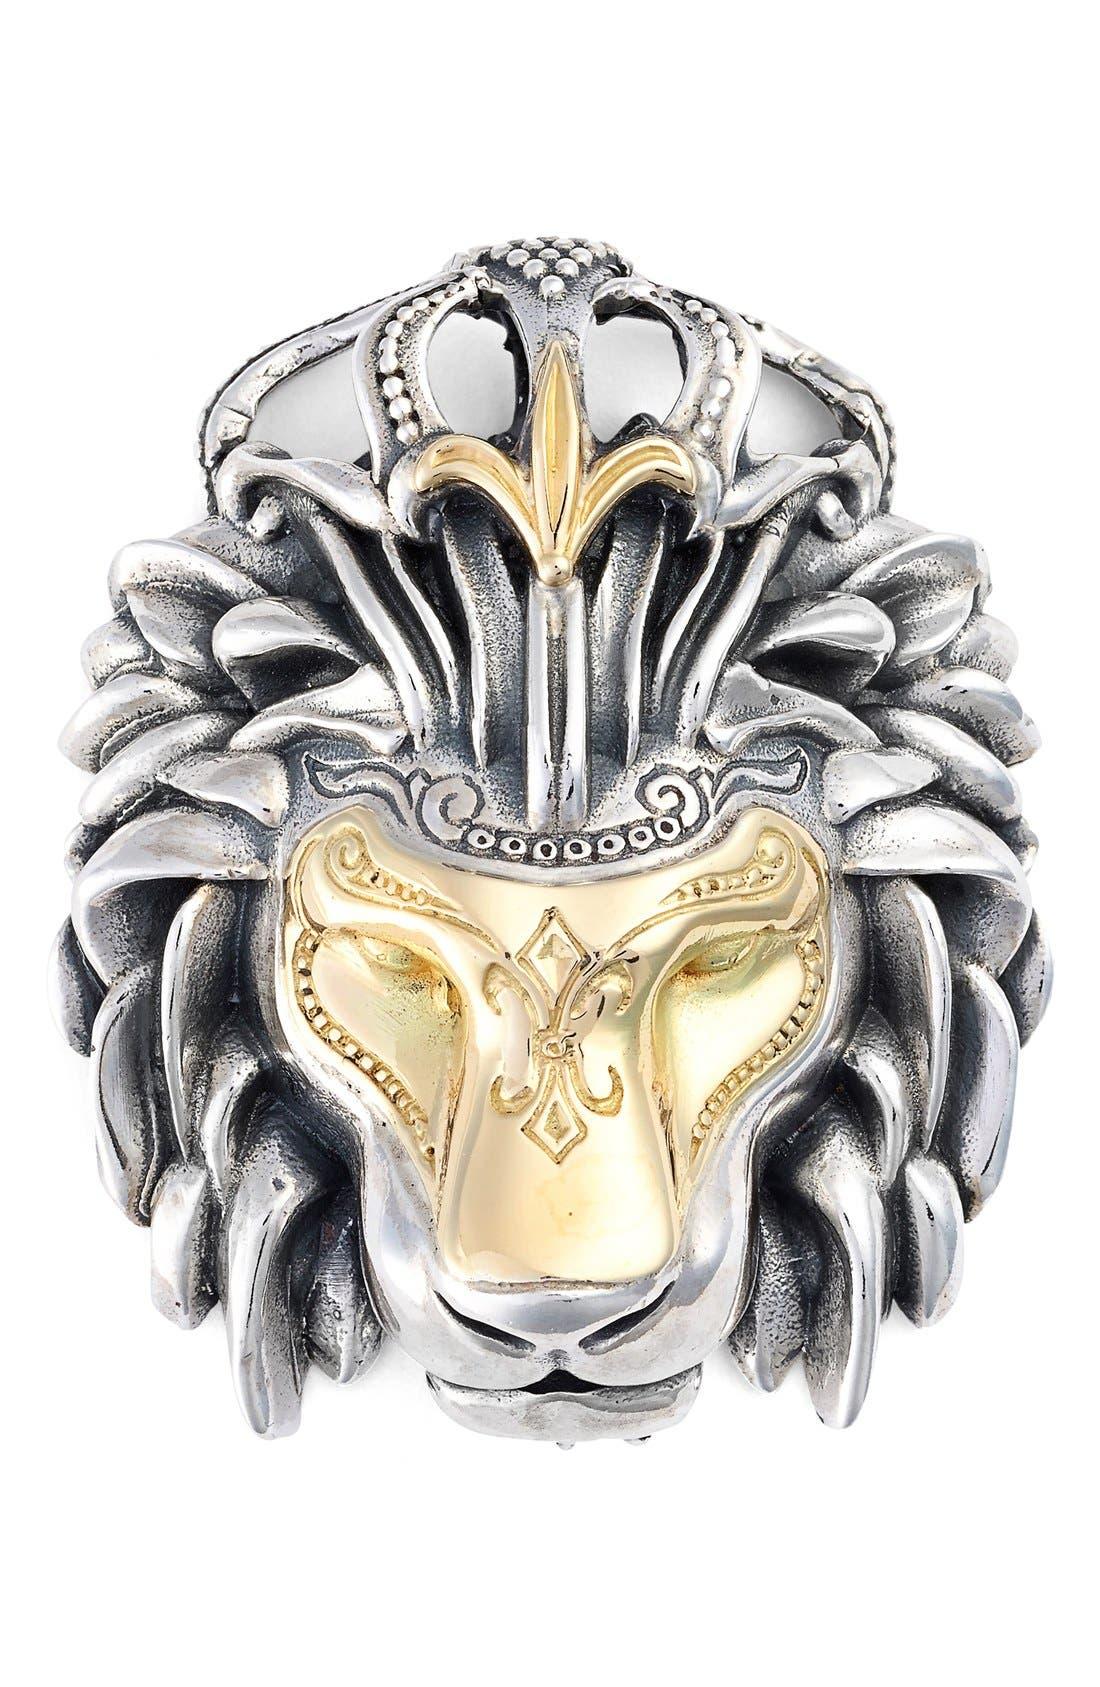 'Minos' Lion Head Pendant,                             Main thumbnail 1, color,                             Silver/ Gold